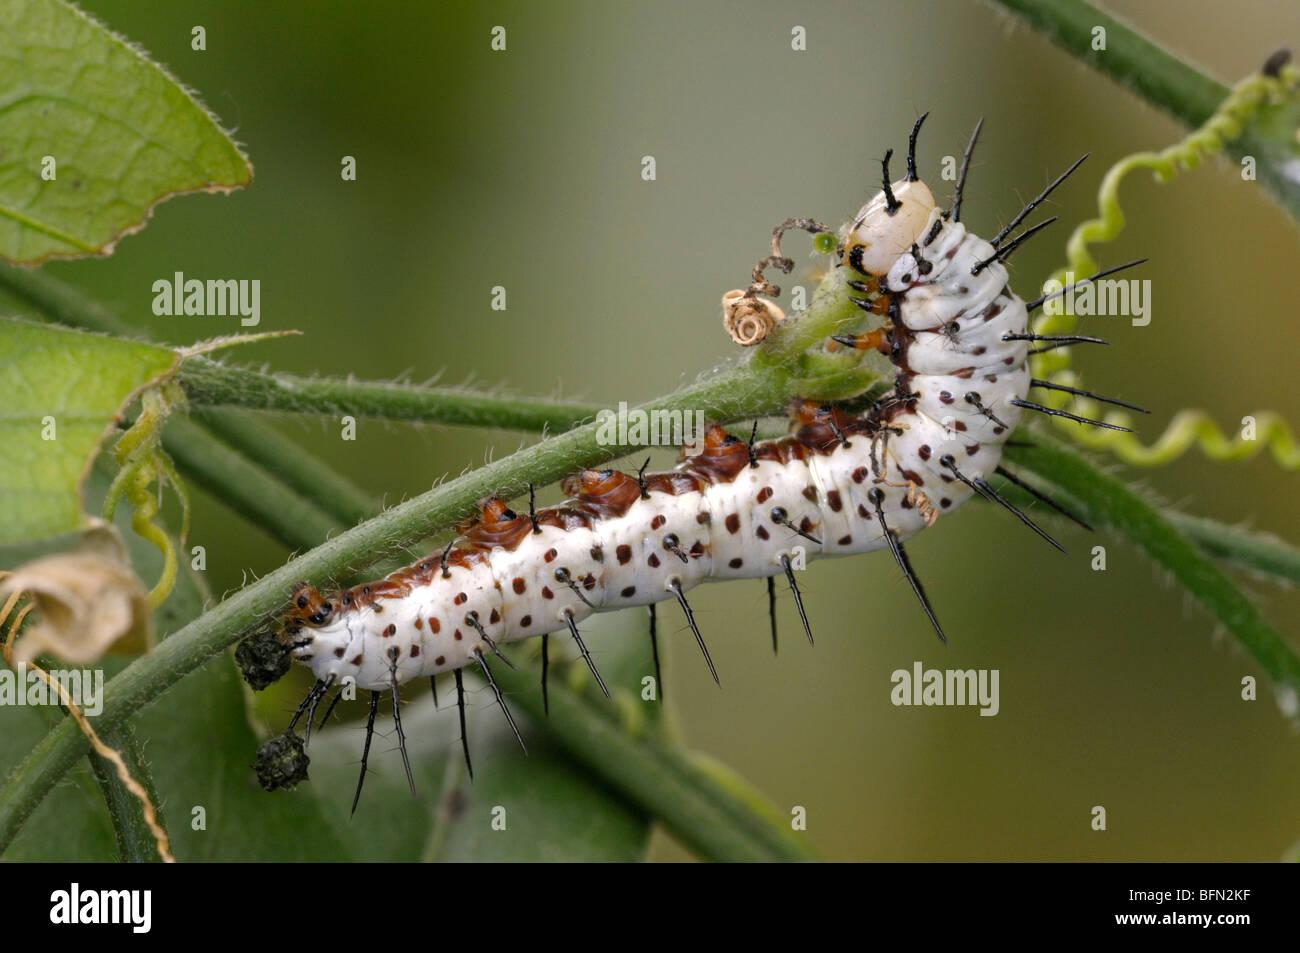 Cebra, cebra Longwing Butterfly (Heliconius charithonia). Caterpillar Passiflora alimentándose de una hoja. Foto de stock